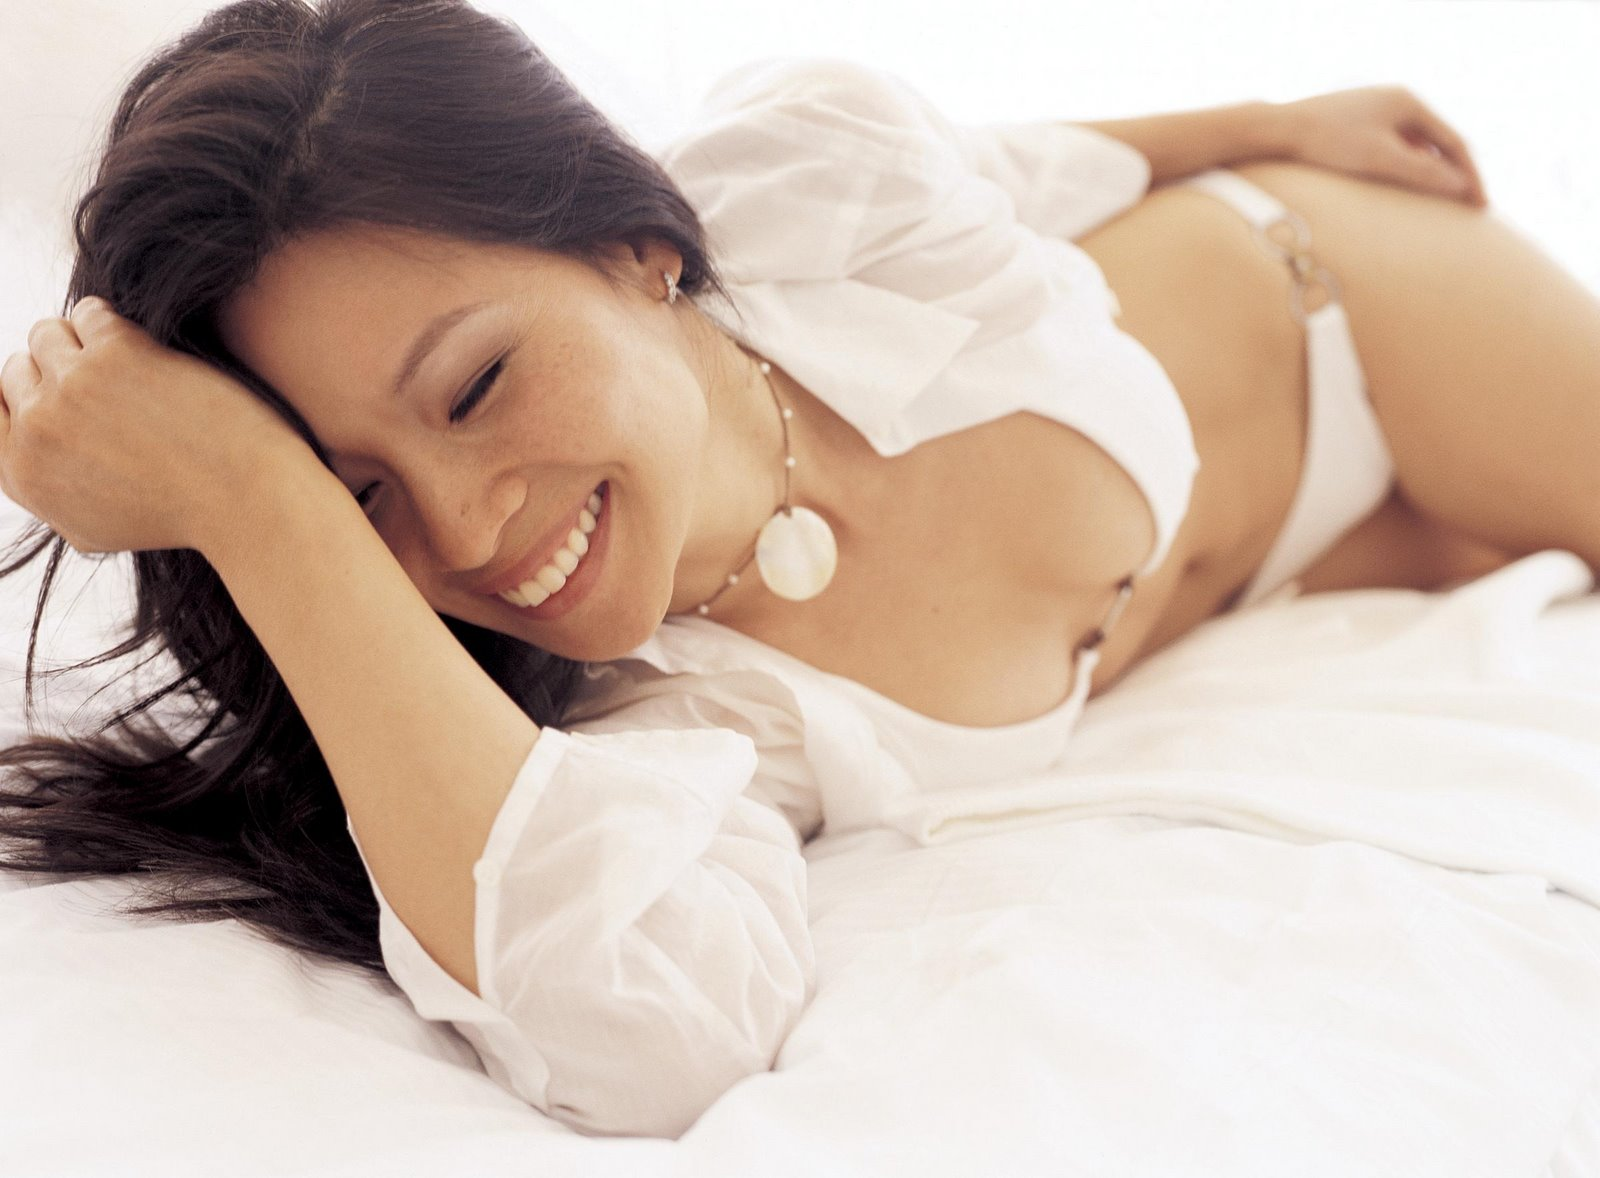 http://3.bp.blogspot.com/-iVHoIQtBH3M/UQ1IFJIr9sI/AAAAAAAAApA/YUYkHs96WIA/s1600/Asian+-+Lucy+Liu+01.jpg